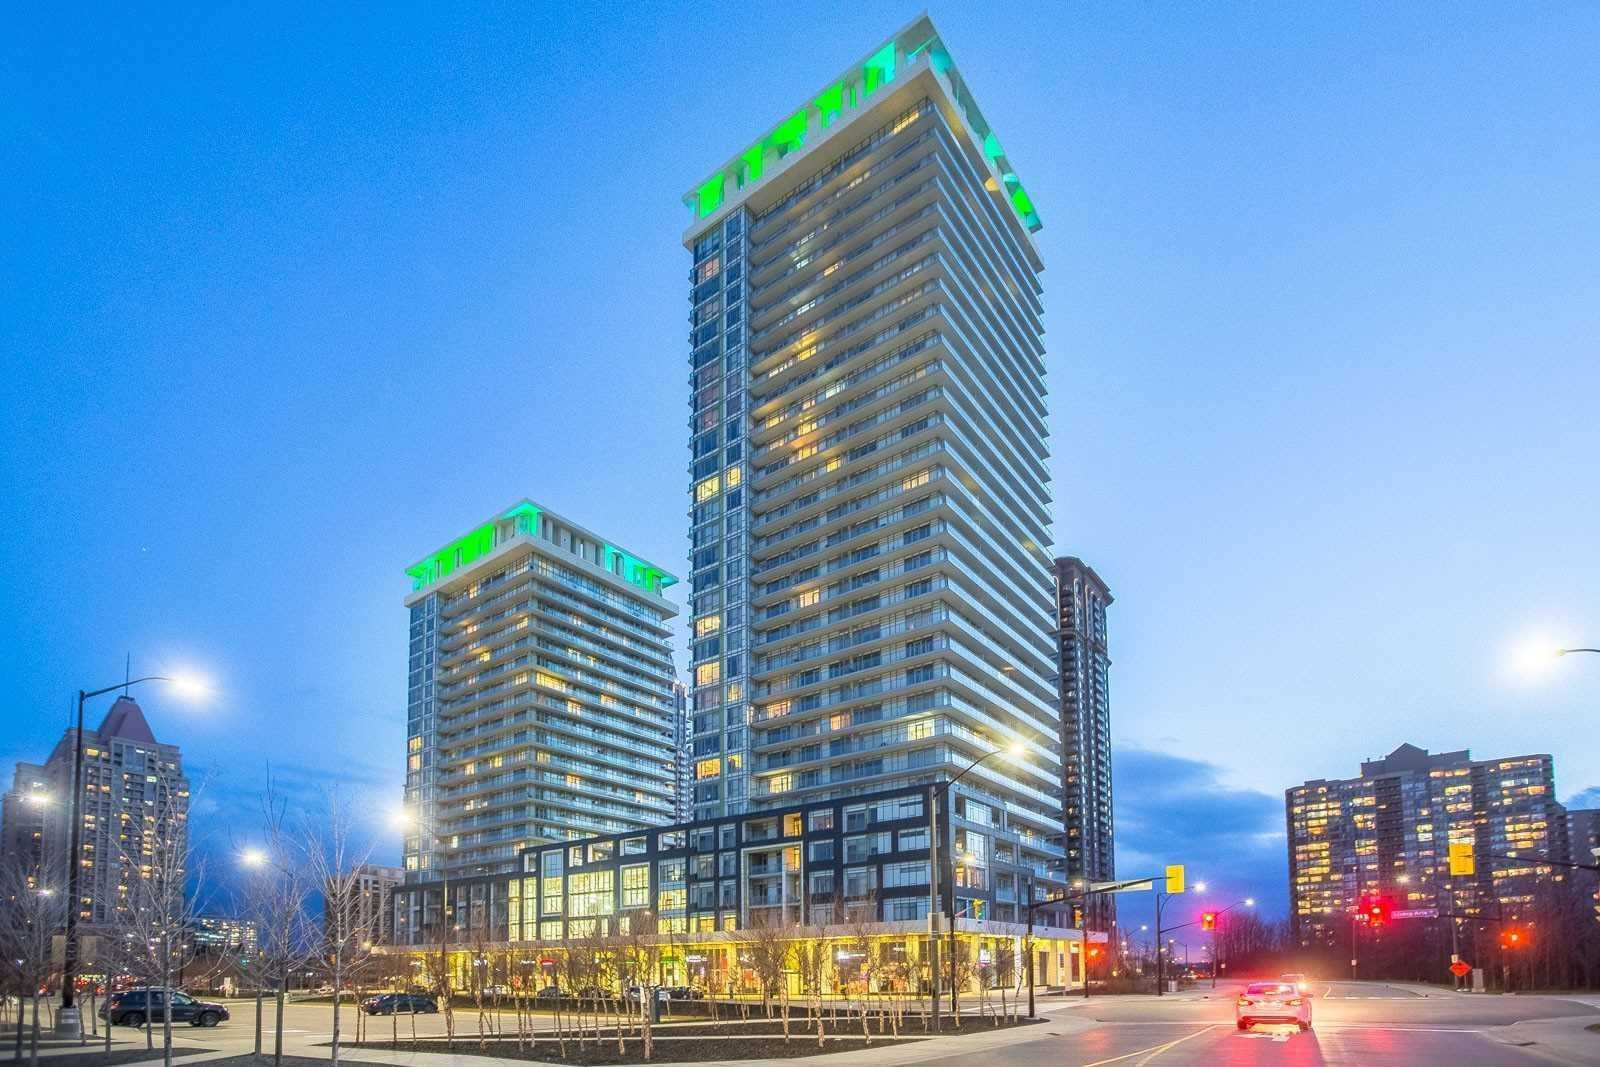 Main Photo: 2703 360 Square One Drive in Mississauga: City Centre Condo for sale : MLS®# W4349827